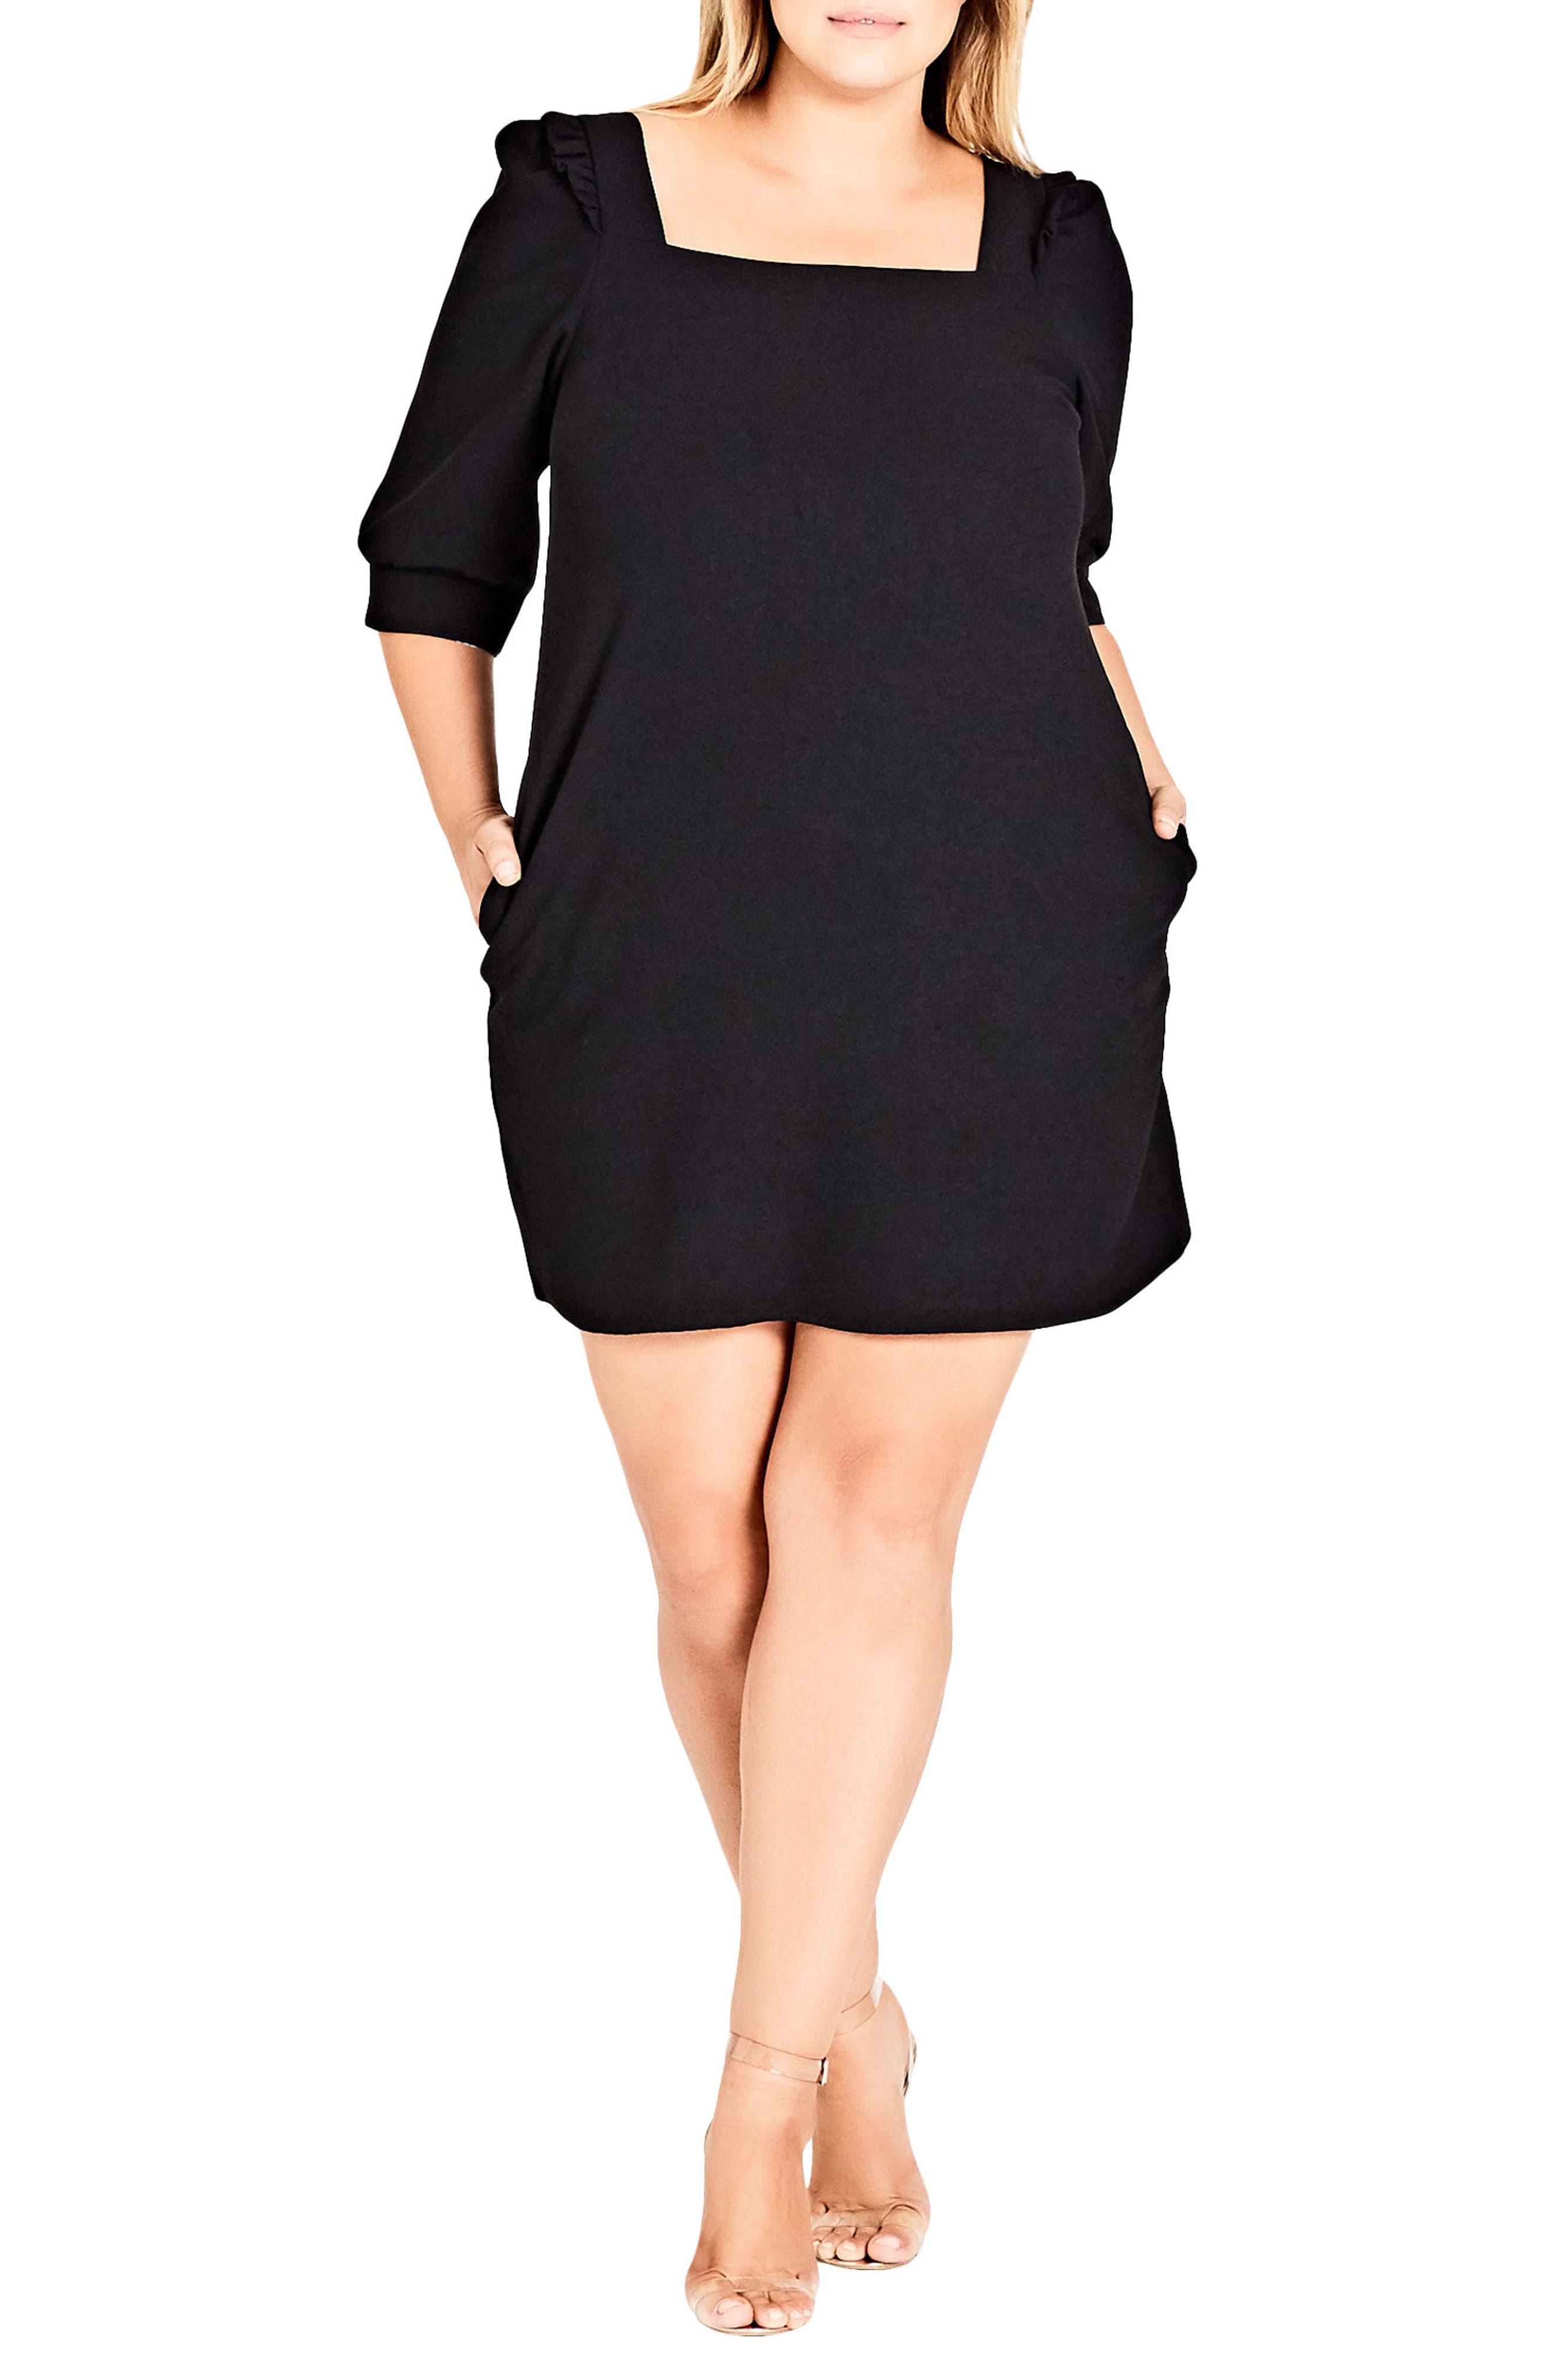 Darling Square Neck Dress,                             Main thumbnail 1, color,                             BLACK